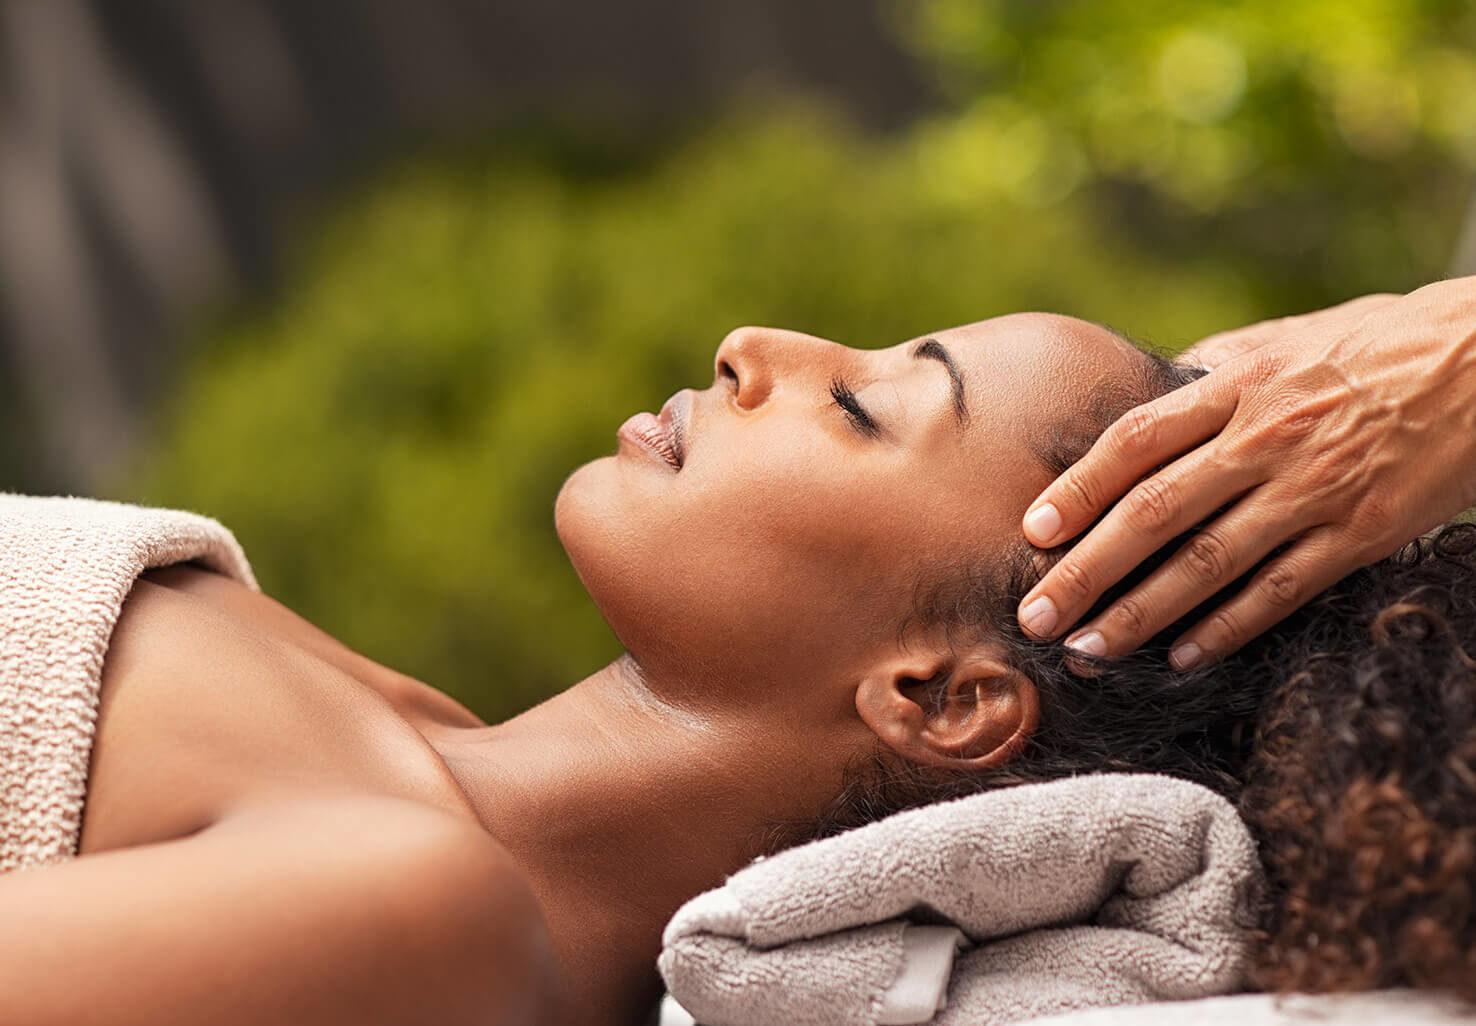 Woman getting a massage on romantic getaway in VA